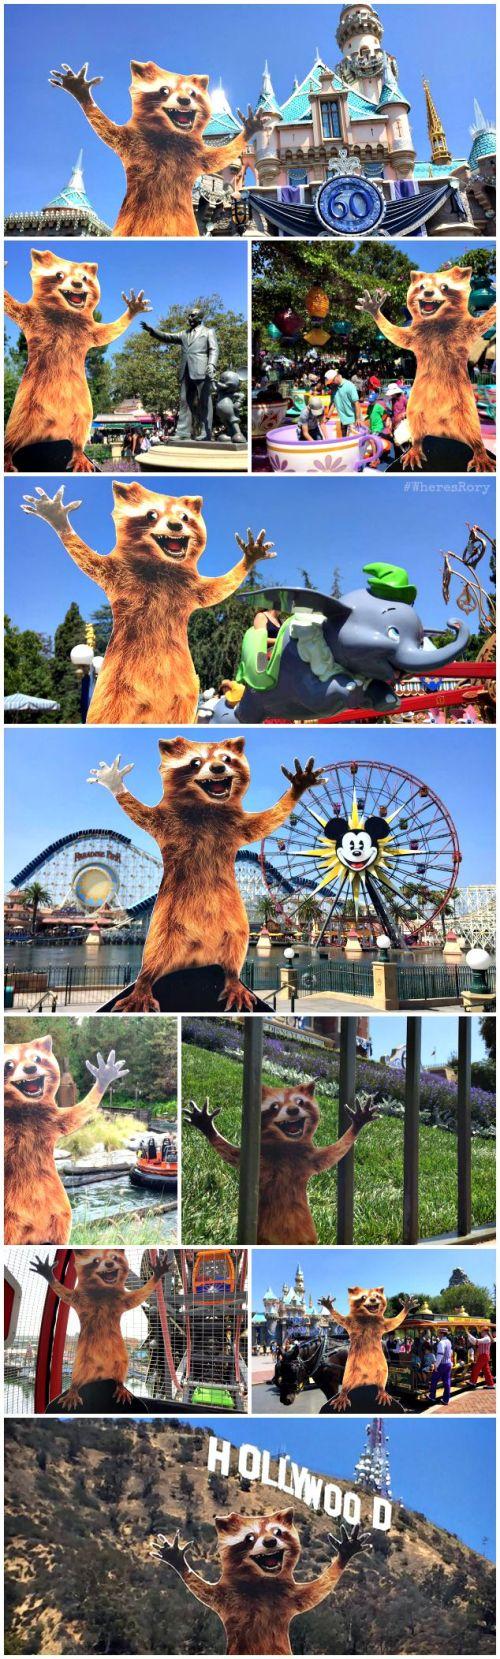 """High-five, Walt."""